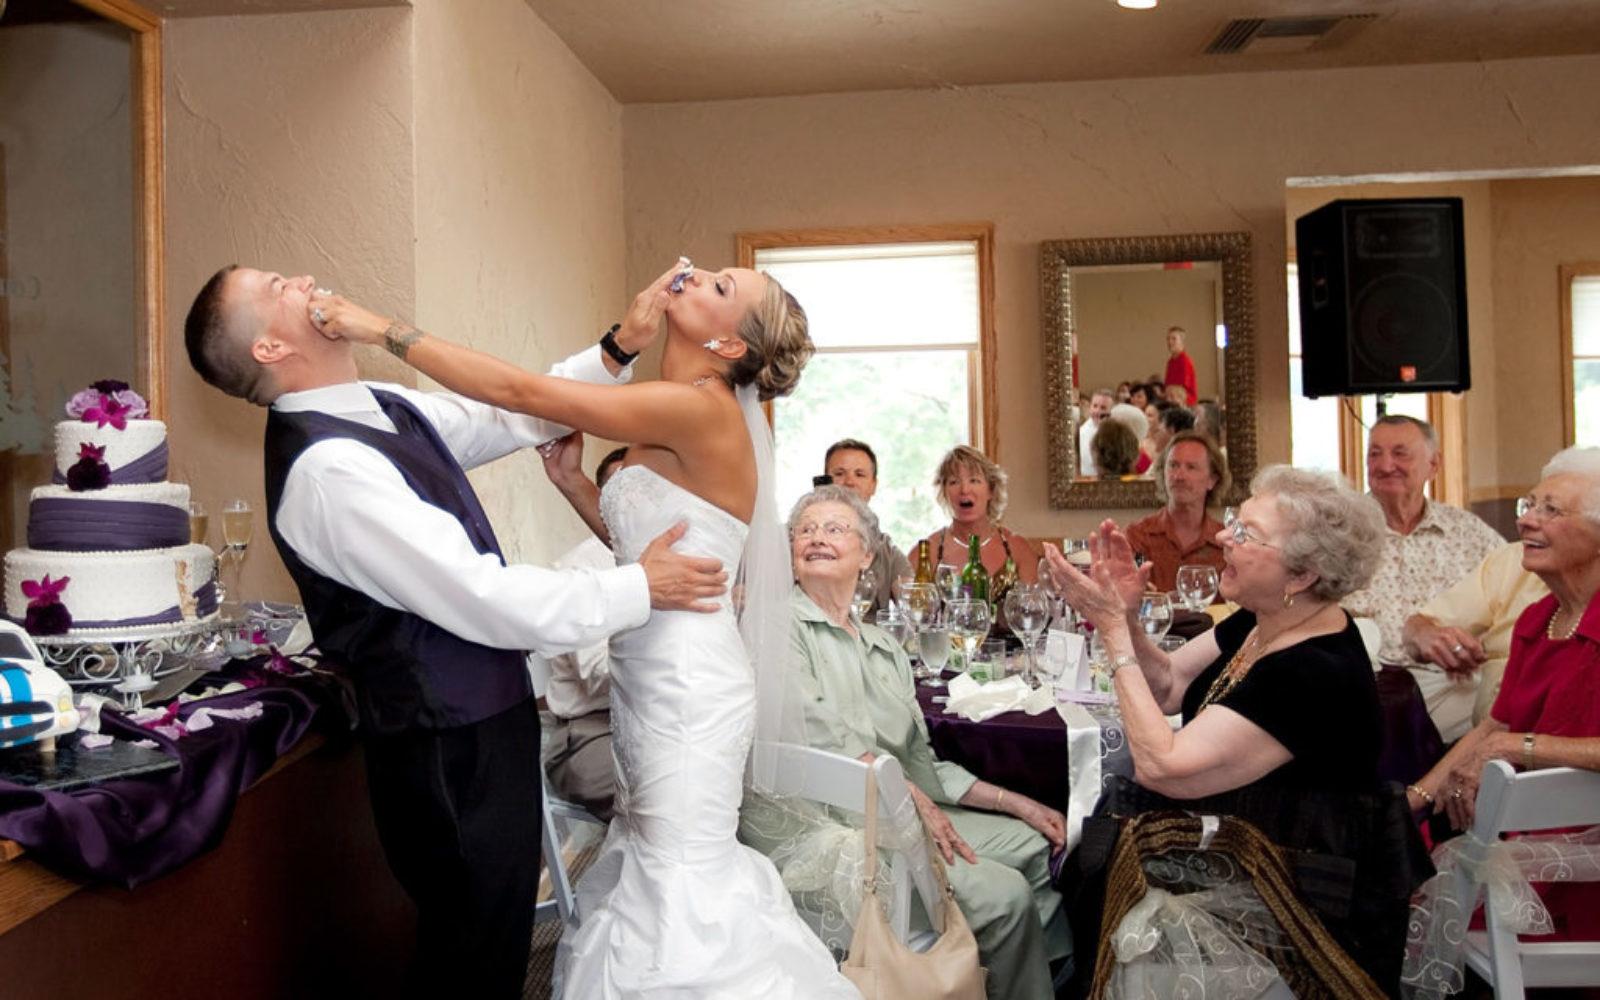 weddingphotographycoloradosprings_66-1024x640